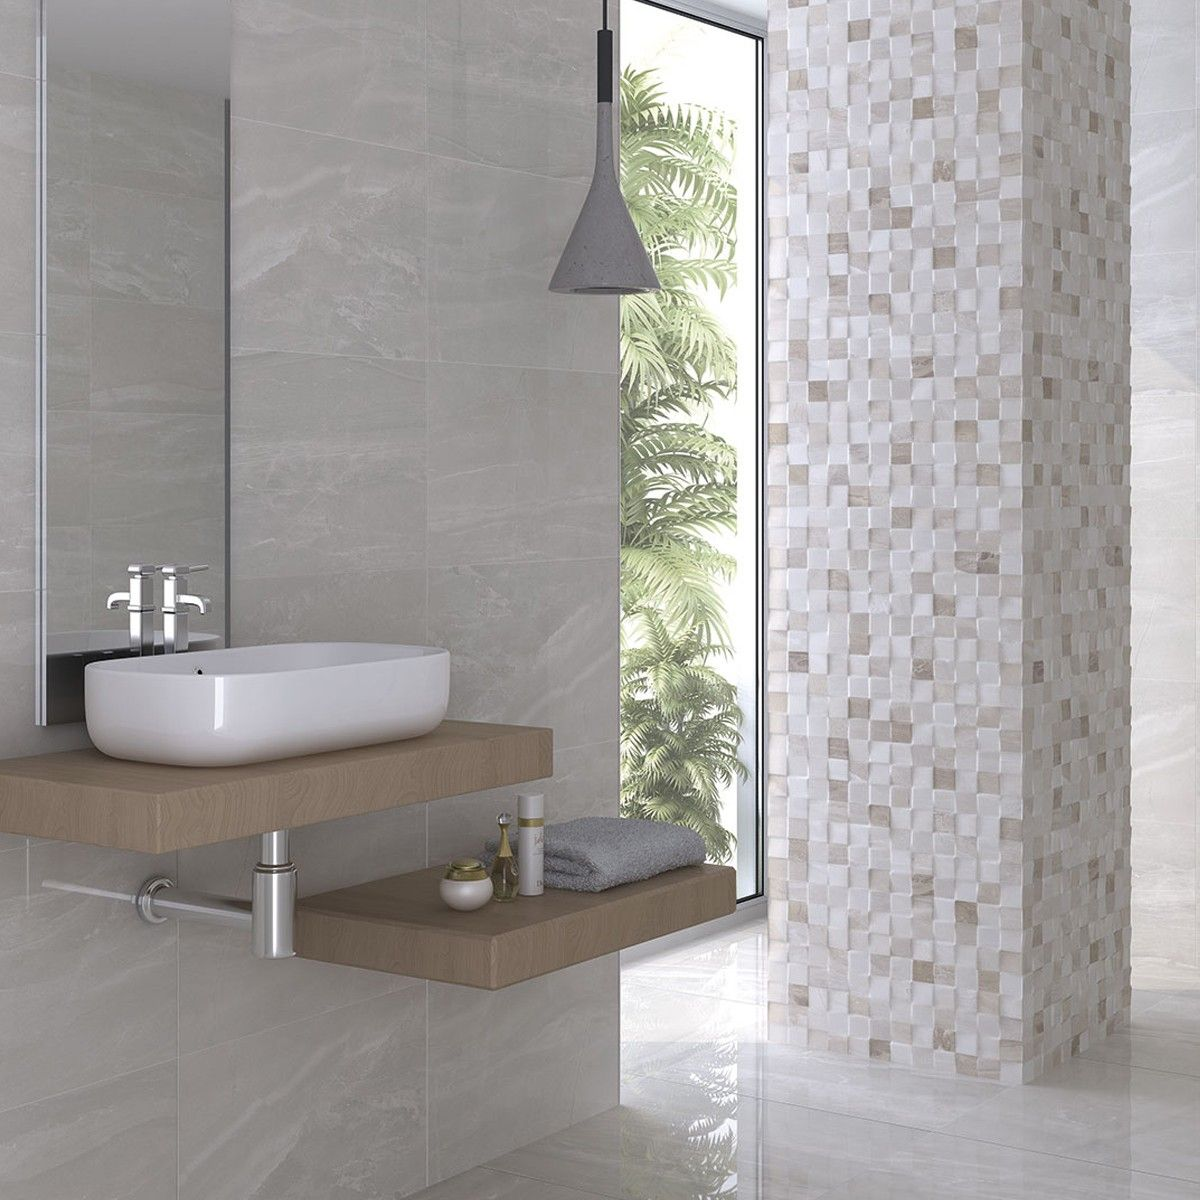 Atrium Kios Pearla 550mm X 333mm With Images Bathroom Wall Tile Wall Tiles